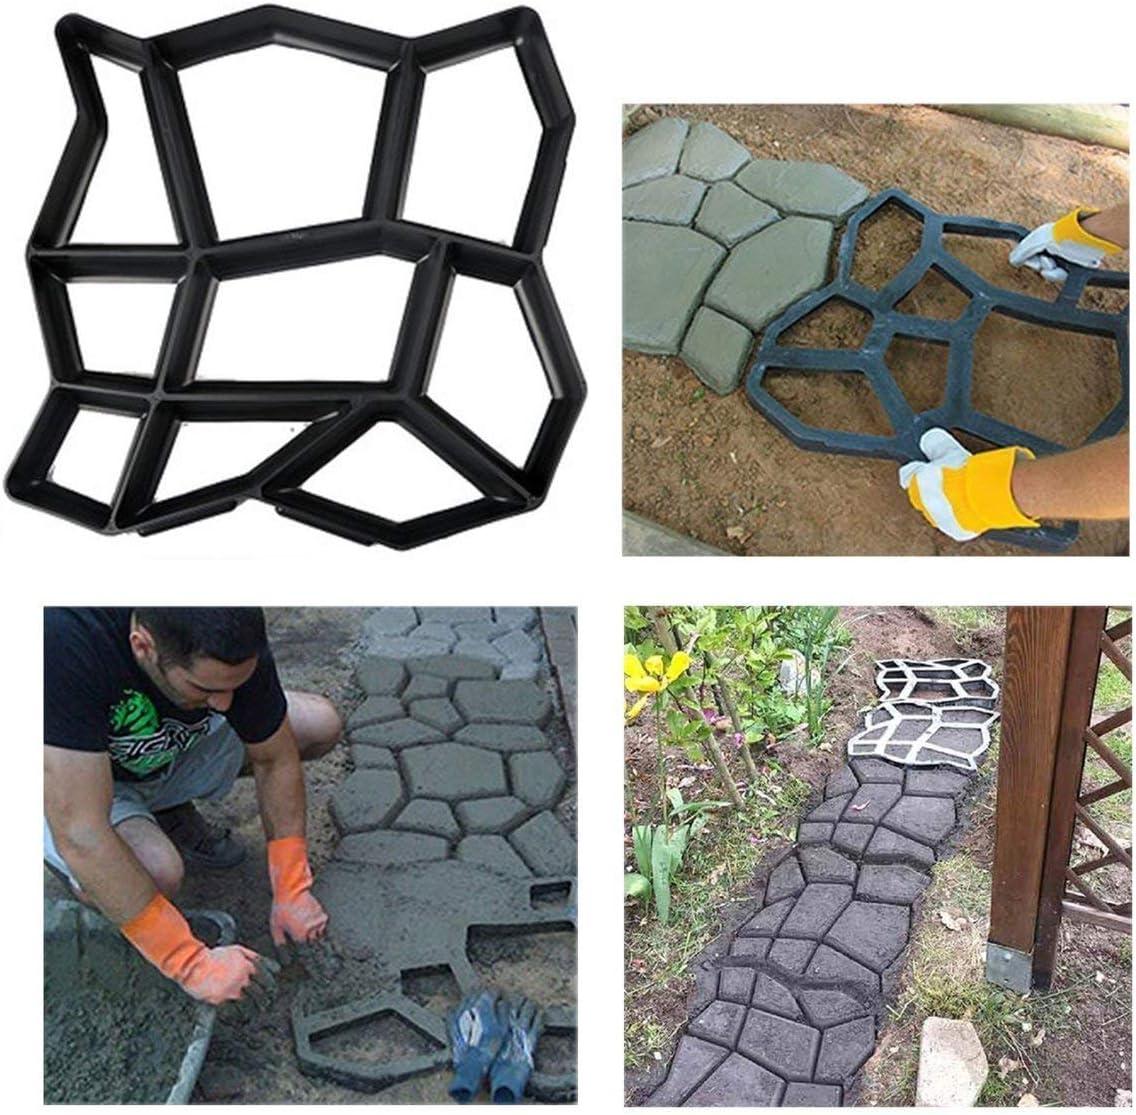 Stageya Path Make Paving Model Reusable Patio Concrete Paving Garden Path Molds,16.5X 16.9